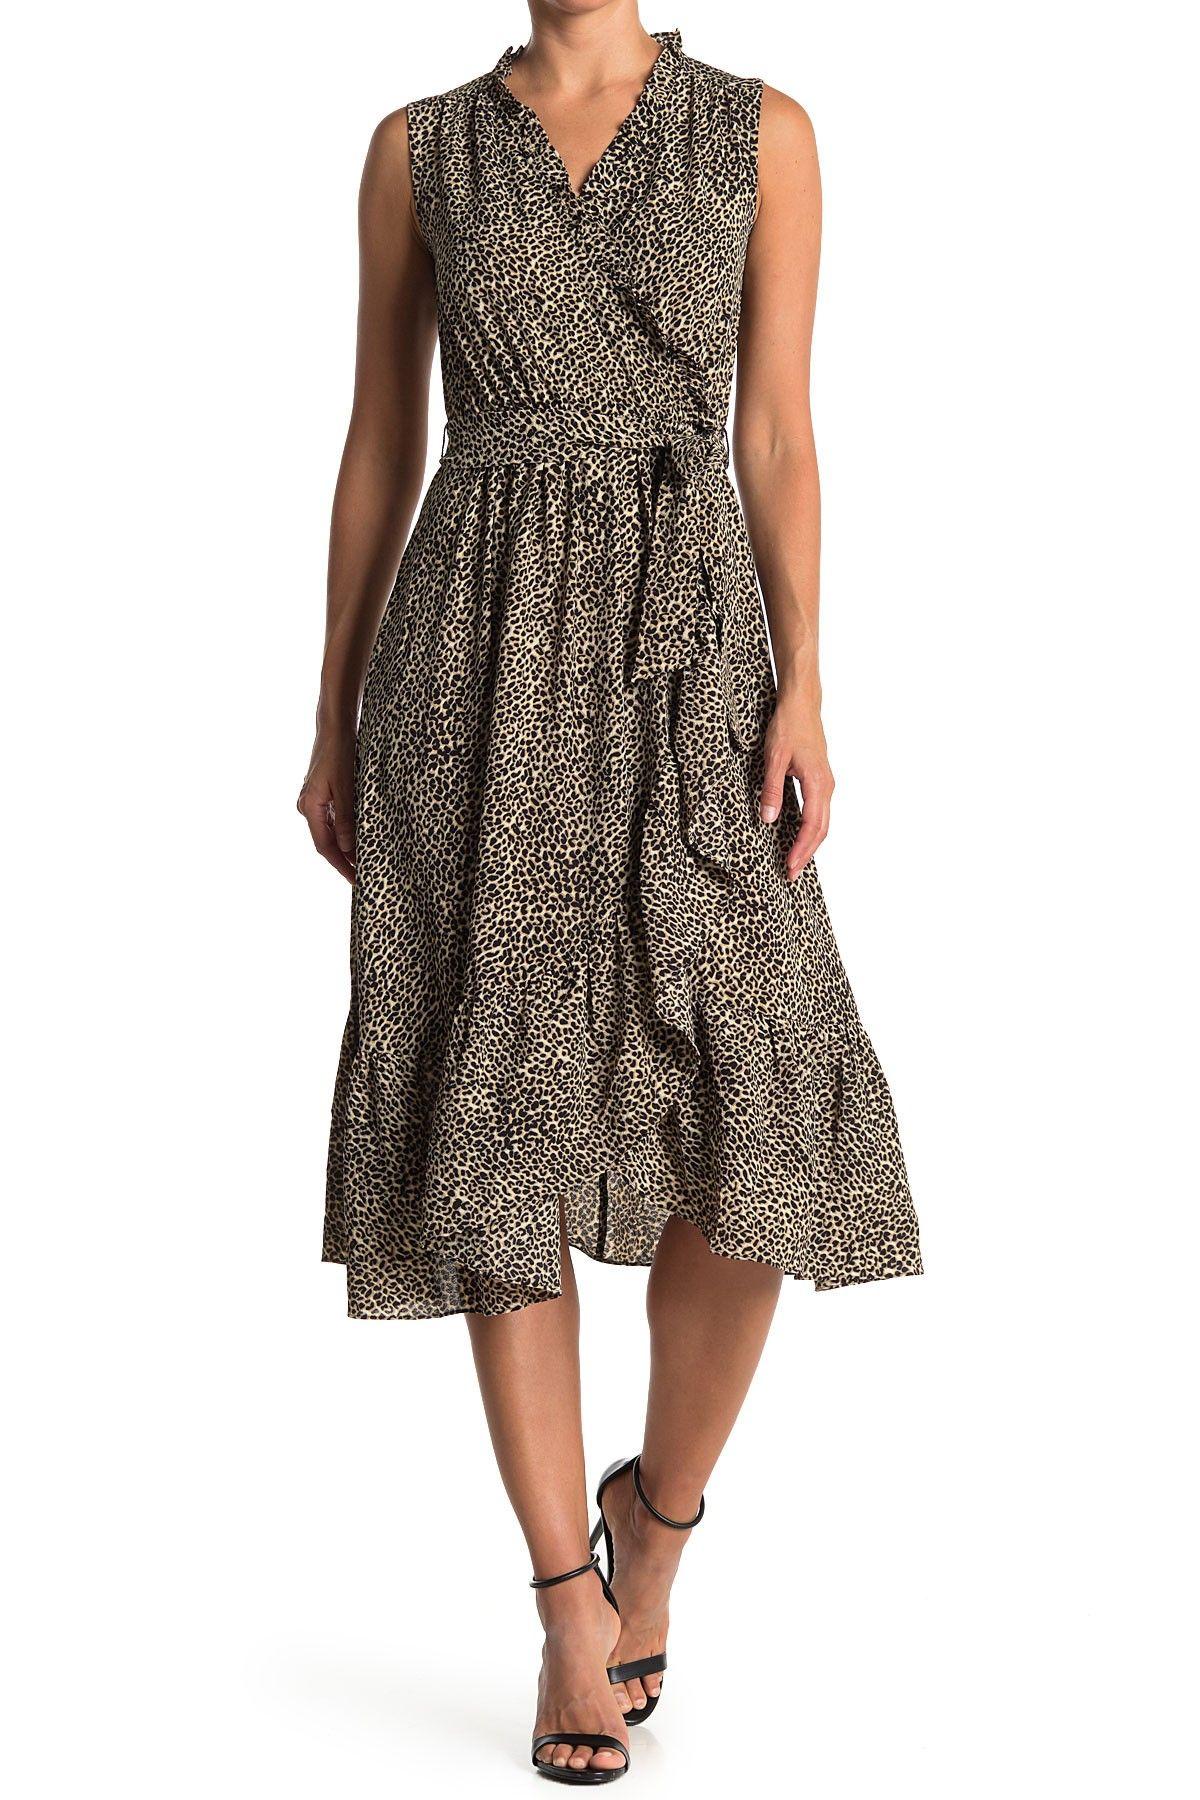 London Times Ruffle Trim Wrap Dress Nordstrom Rack Dresses Wrap Dress Nordstrom Dresses [ 1800 x 1200 Pixel ]